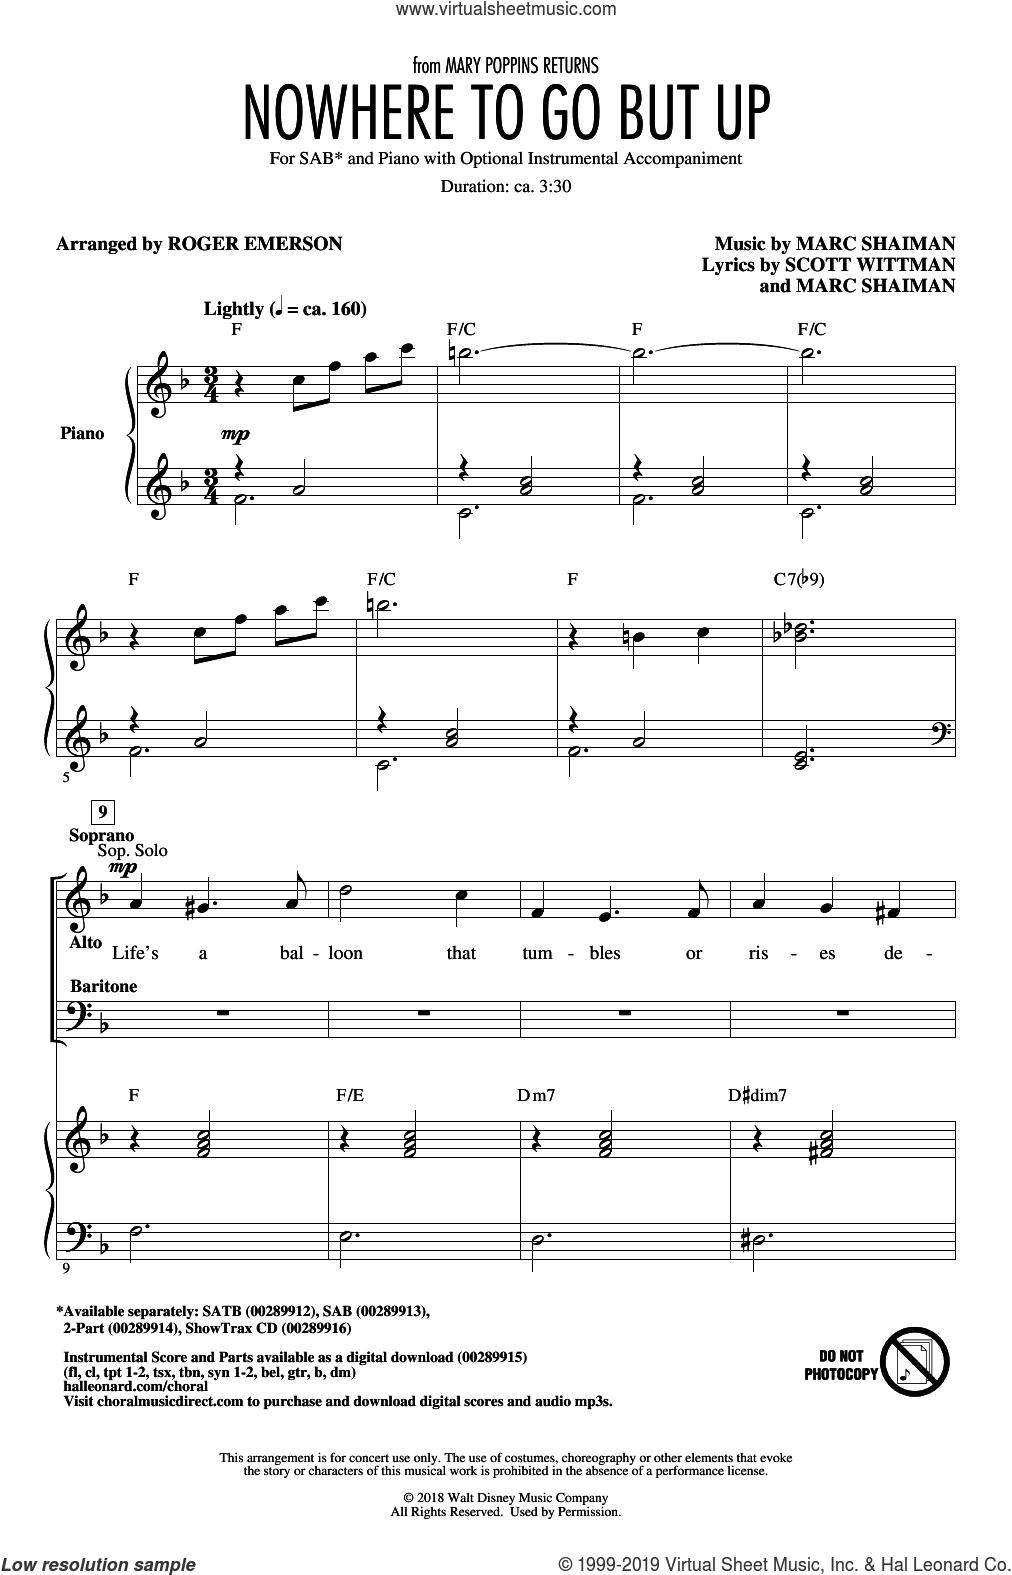 Nowhere To Go But Up (from Mary Poppins Returns) (arr. Roger Emerson) sheet music for choir (SAB: soprano, alto, bass) by Marc Shaiman, Roger Emerson, Angela Lansbury & Company, Marc Shaiman & Scott Wittman and Scott Wittman, intermediate skill level